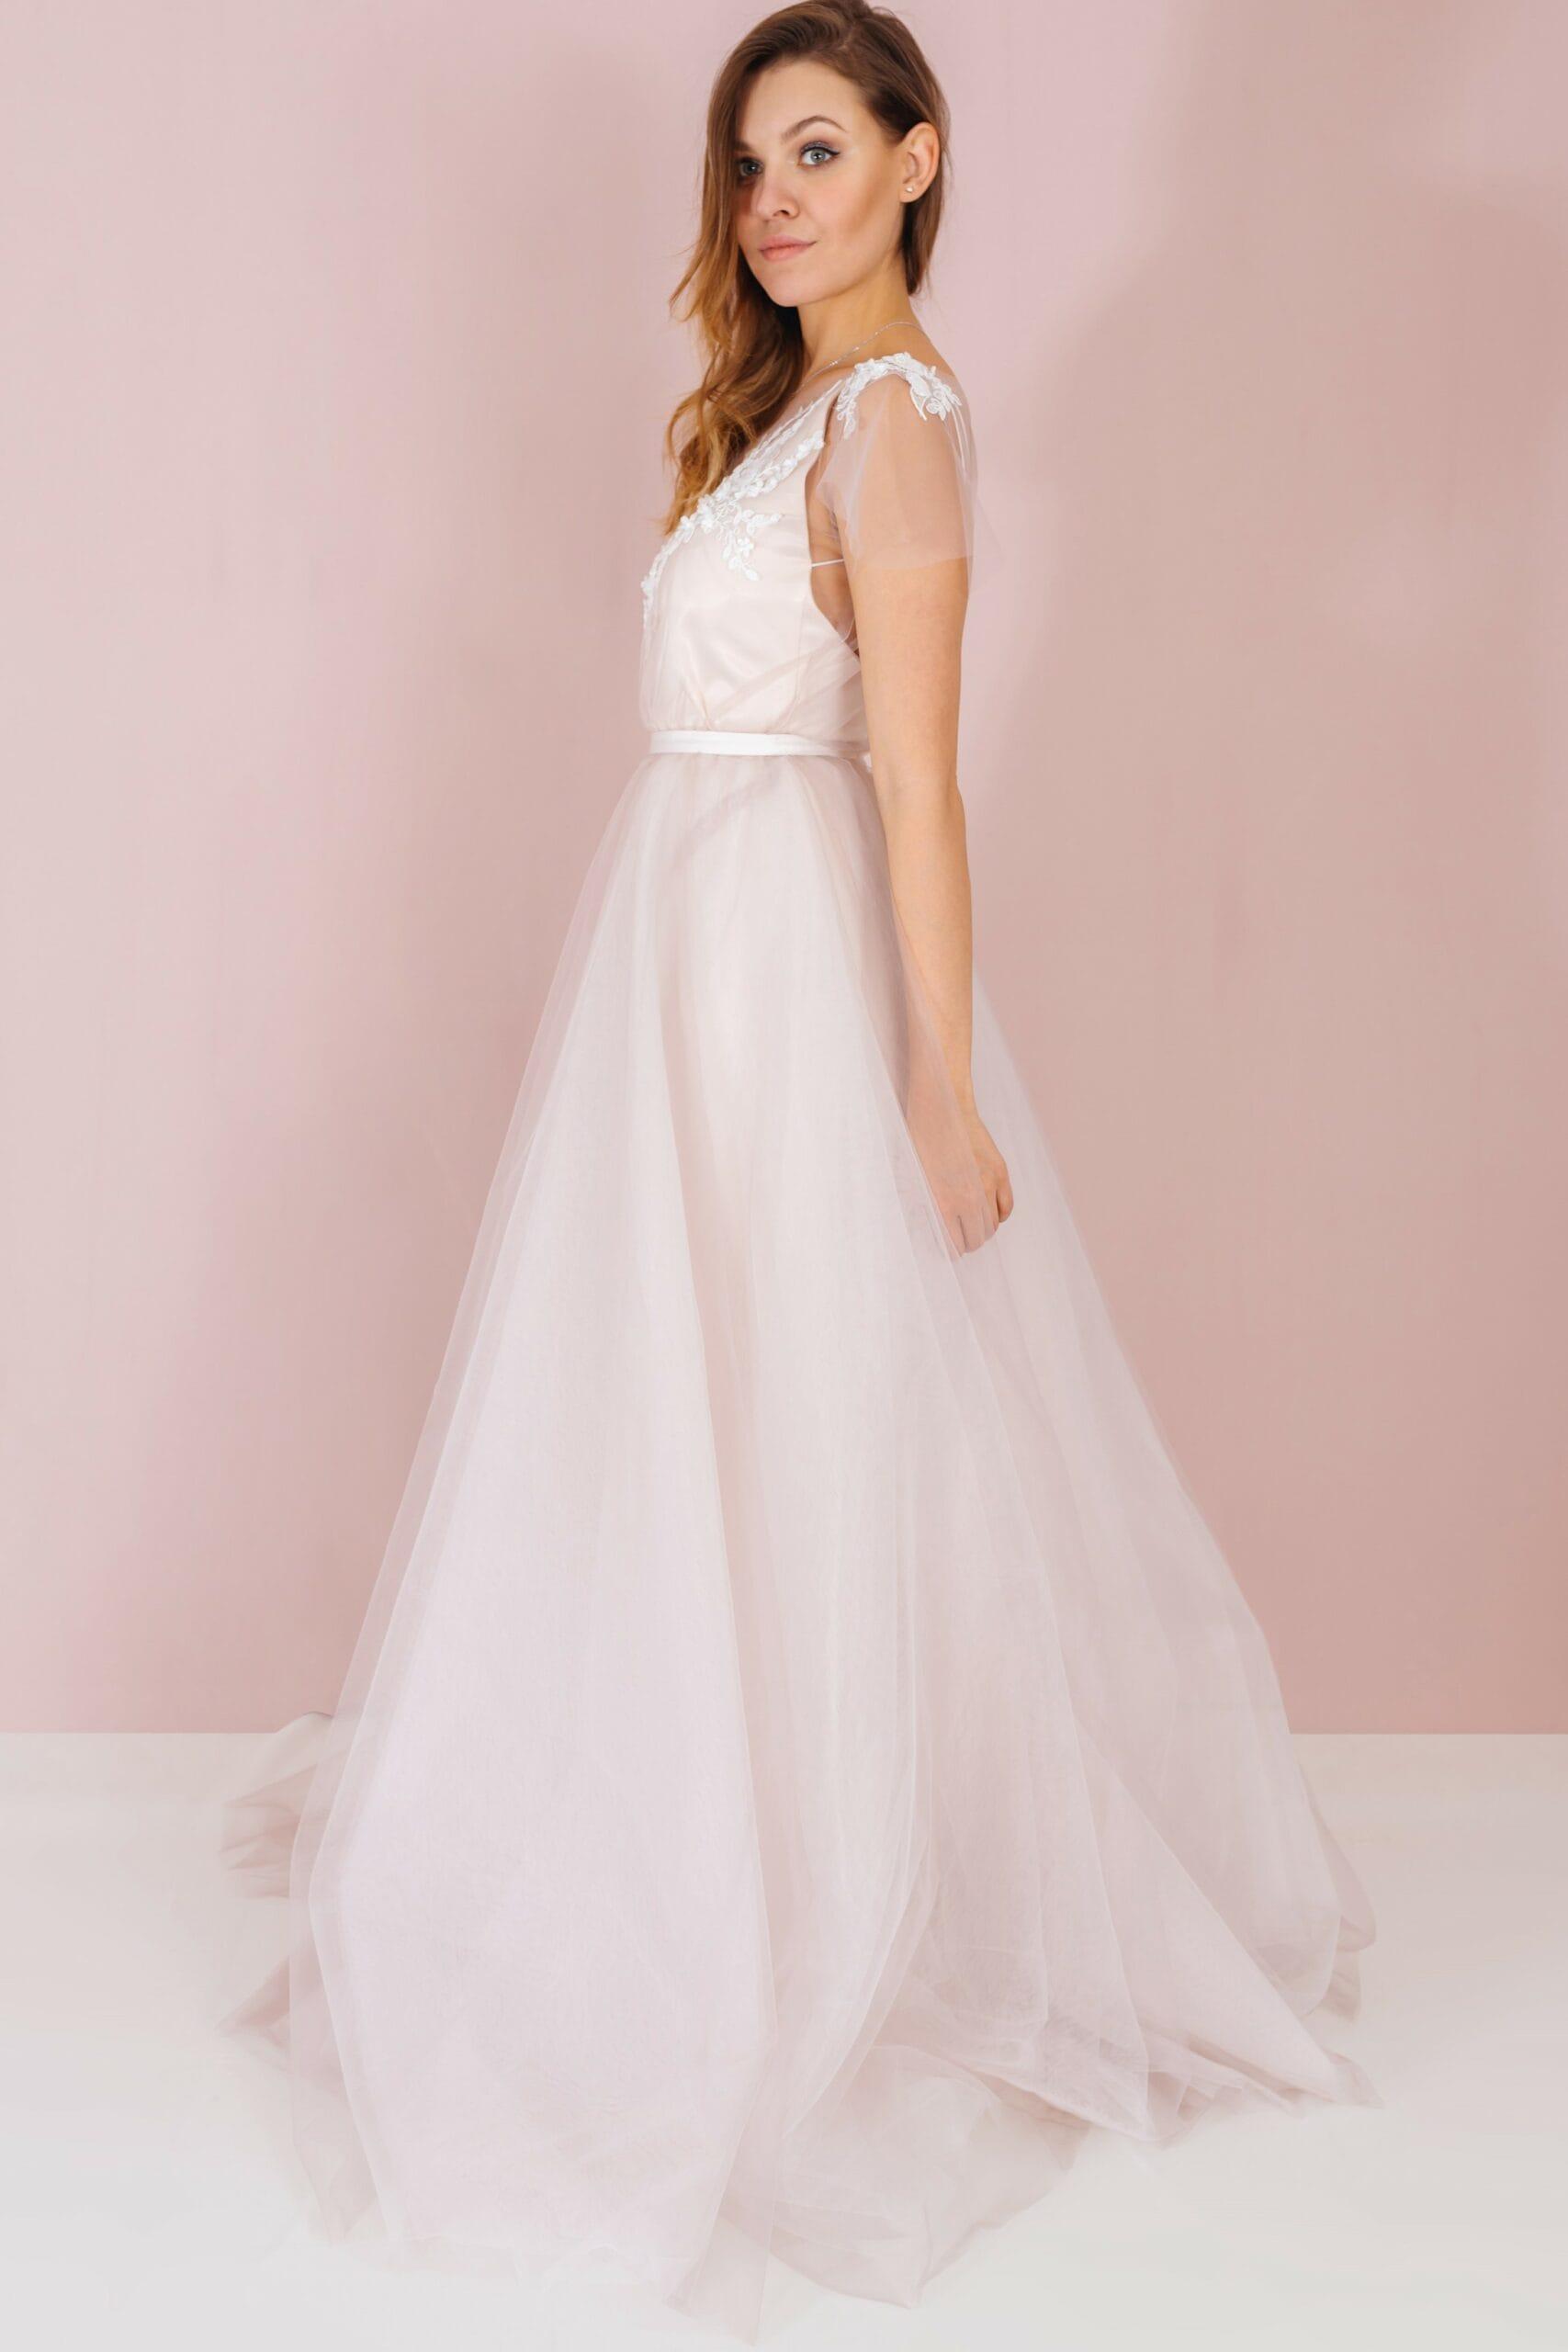 Свадебное платье LOTTI, коллекция LOFT, бренд RARE BRIDAL, фото 1